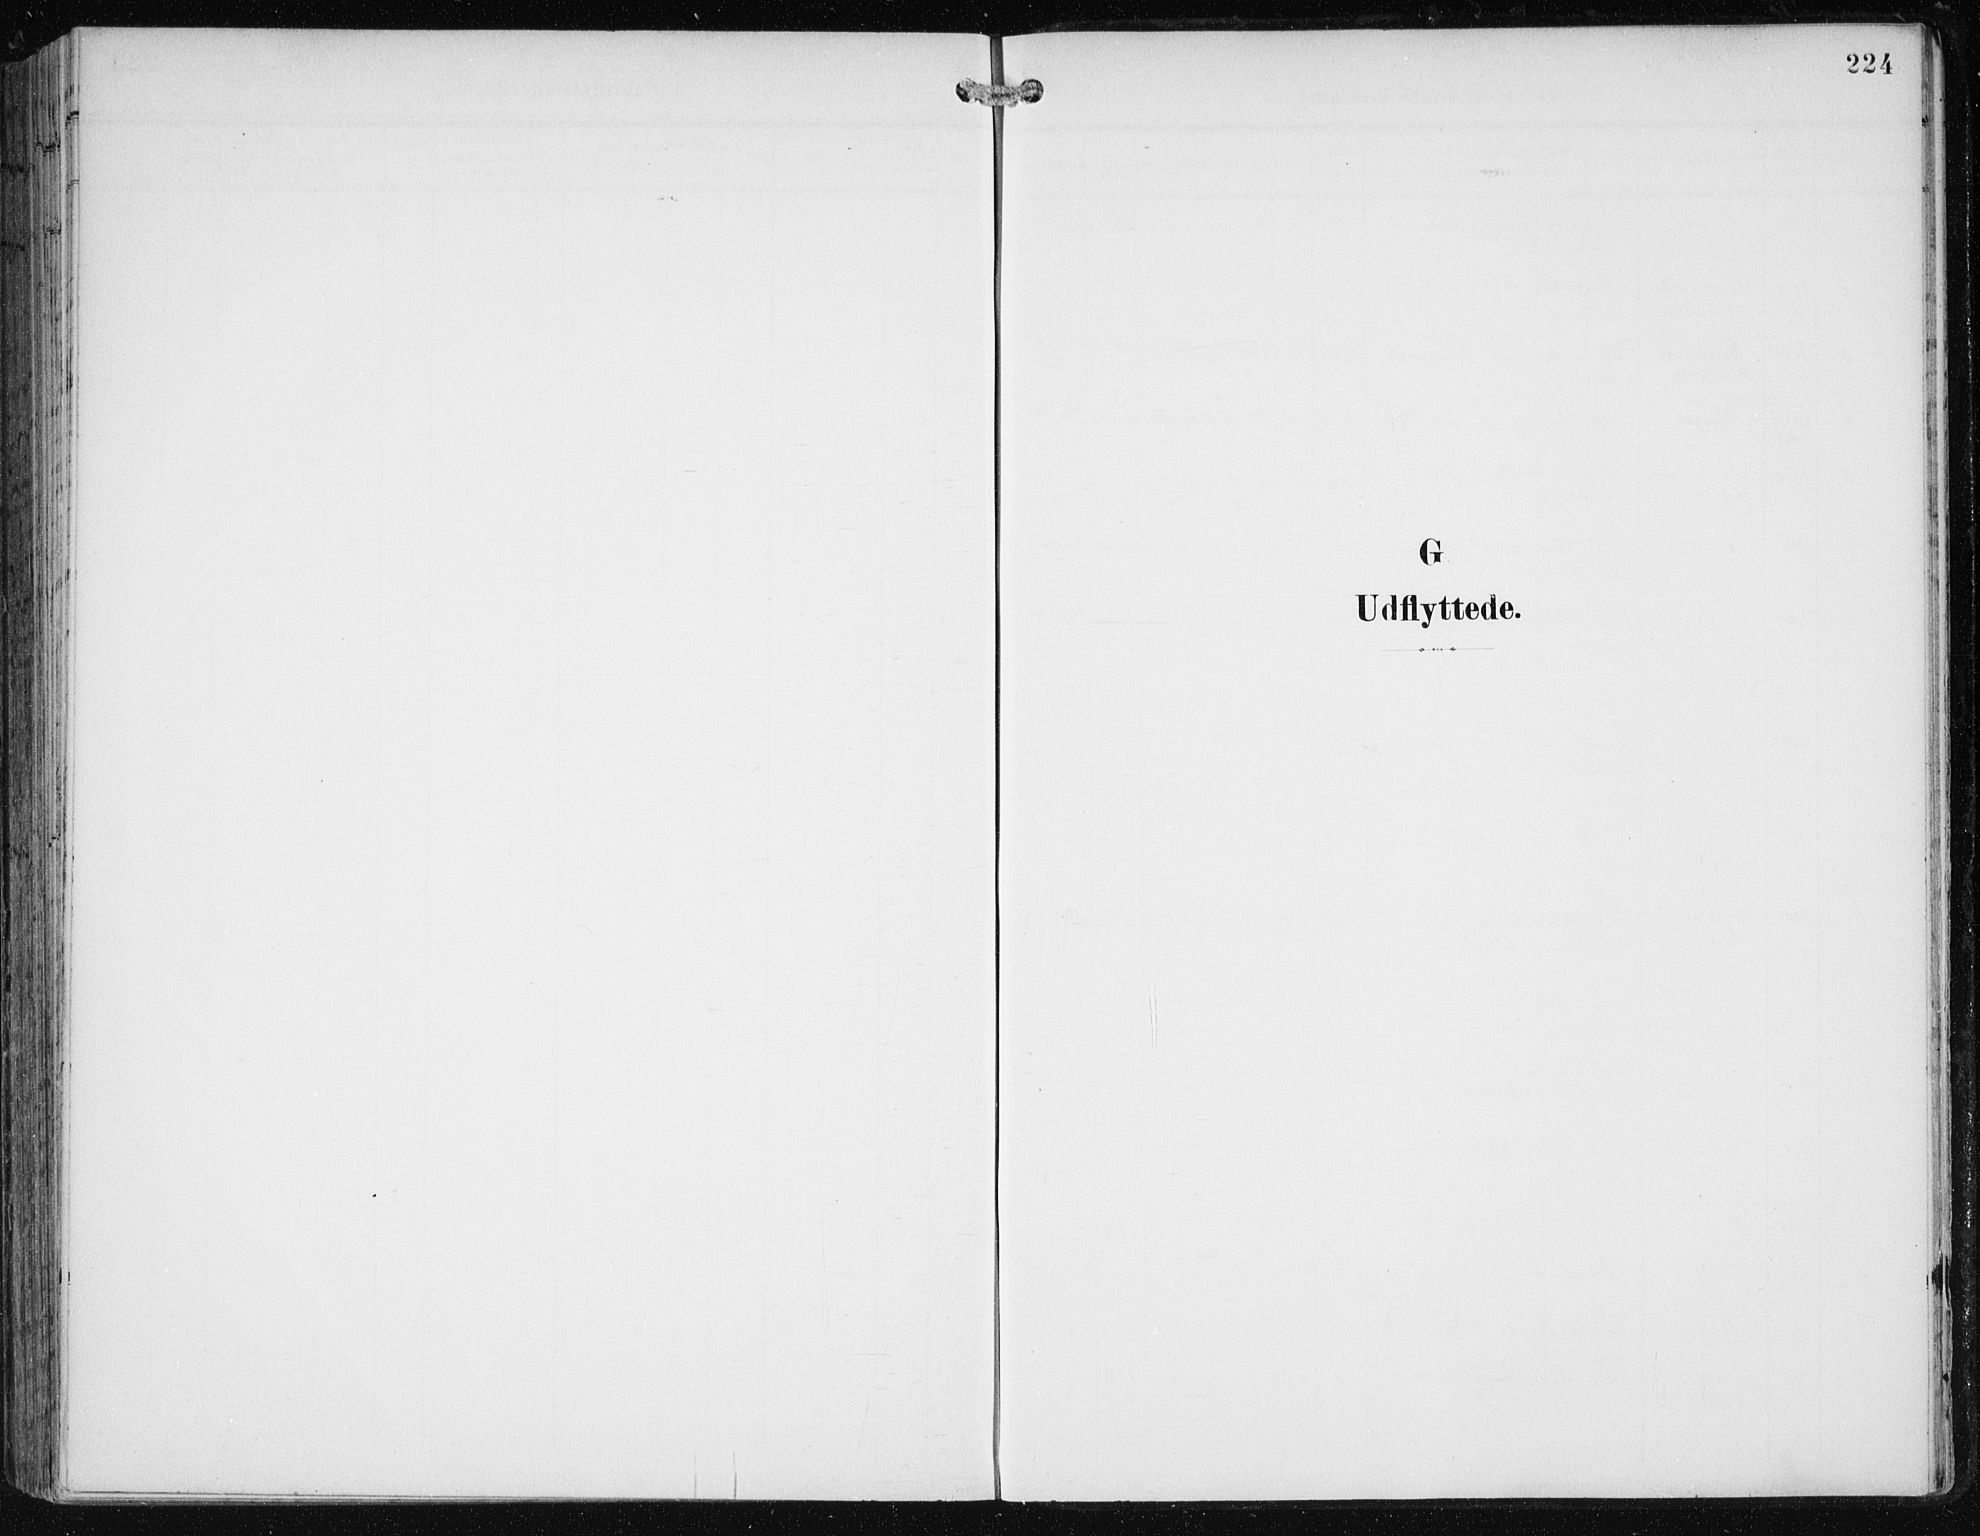 SAB, Fana Sokneprestembete, H/Haa/Haai/L0003: Ministerialbok nr. I 3, 1900-1912, s. 224